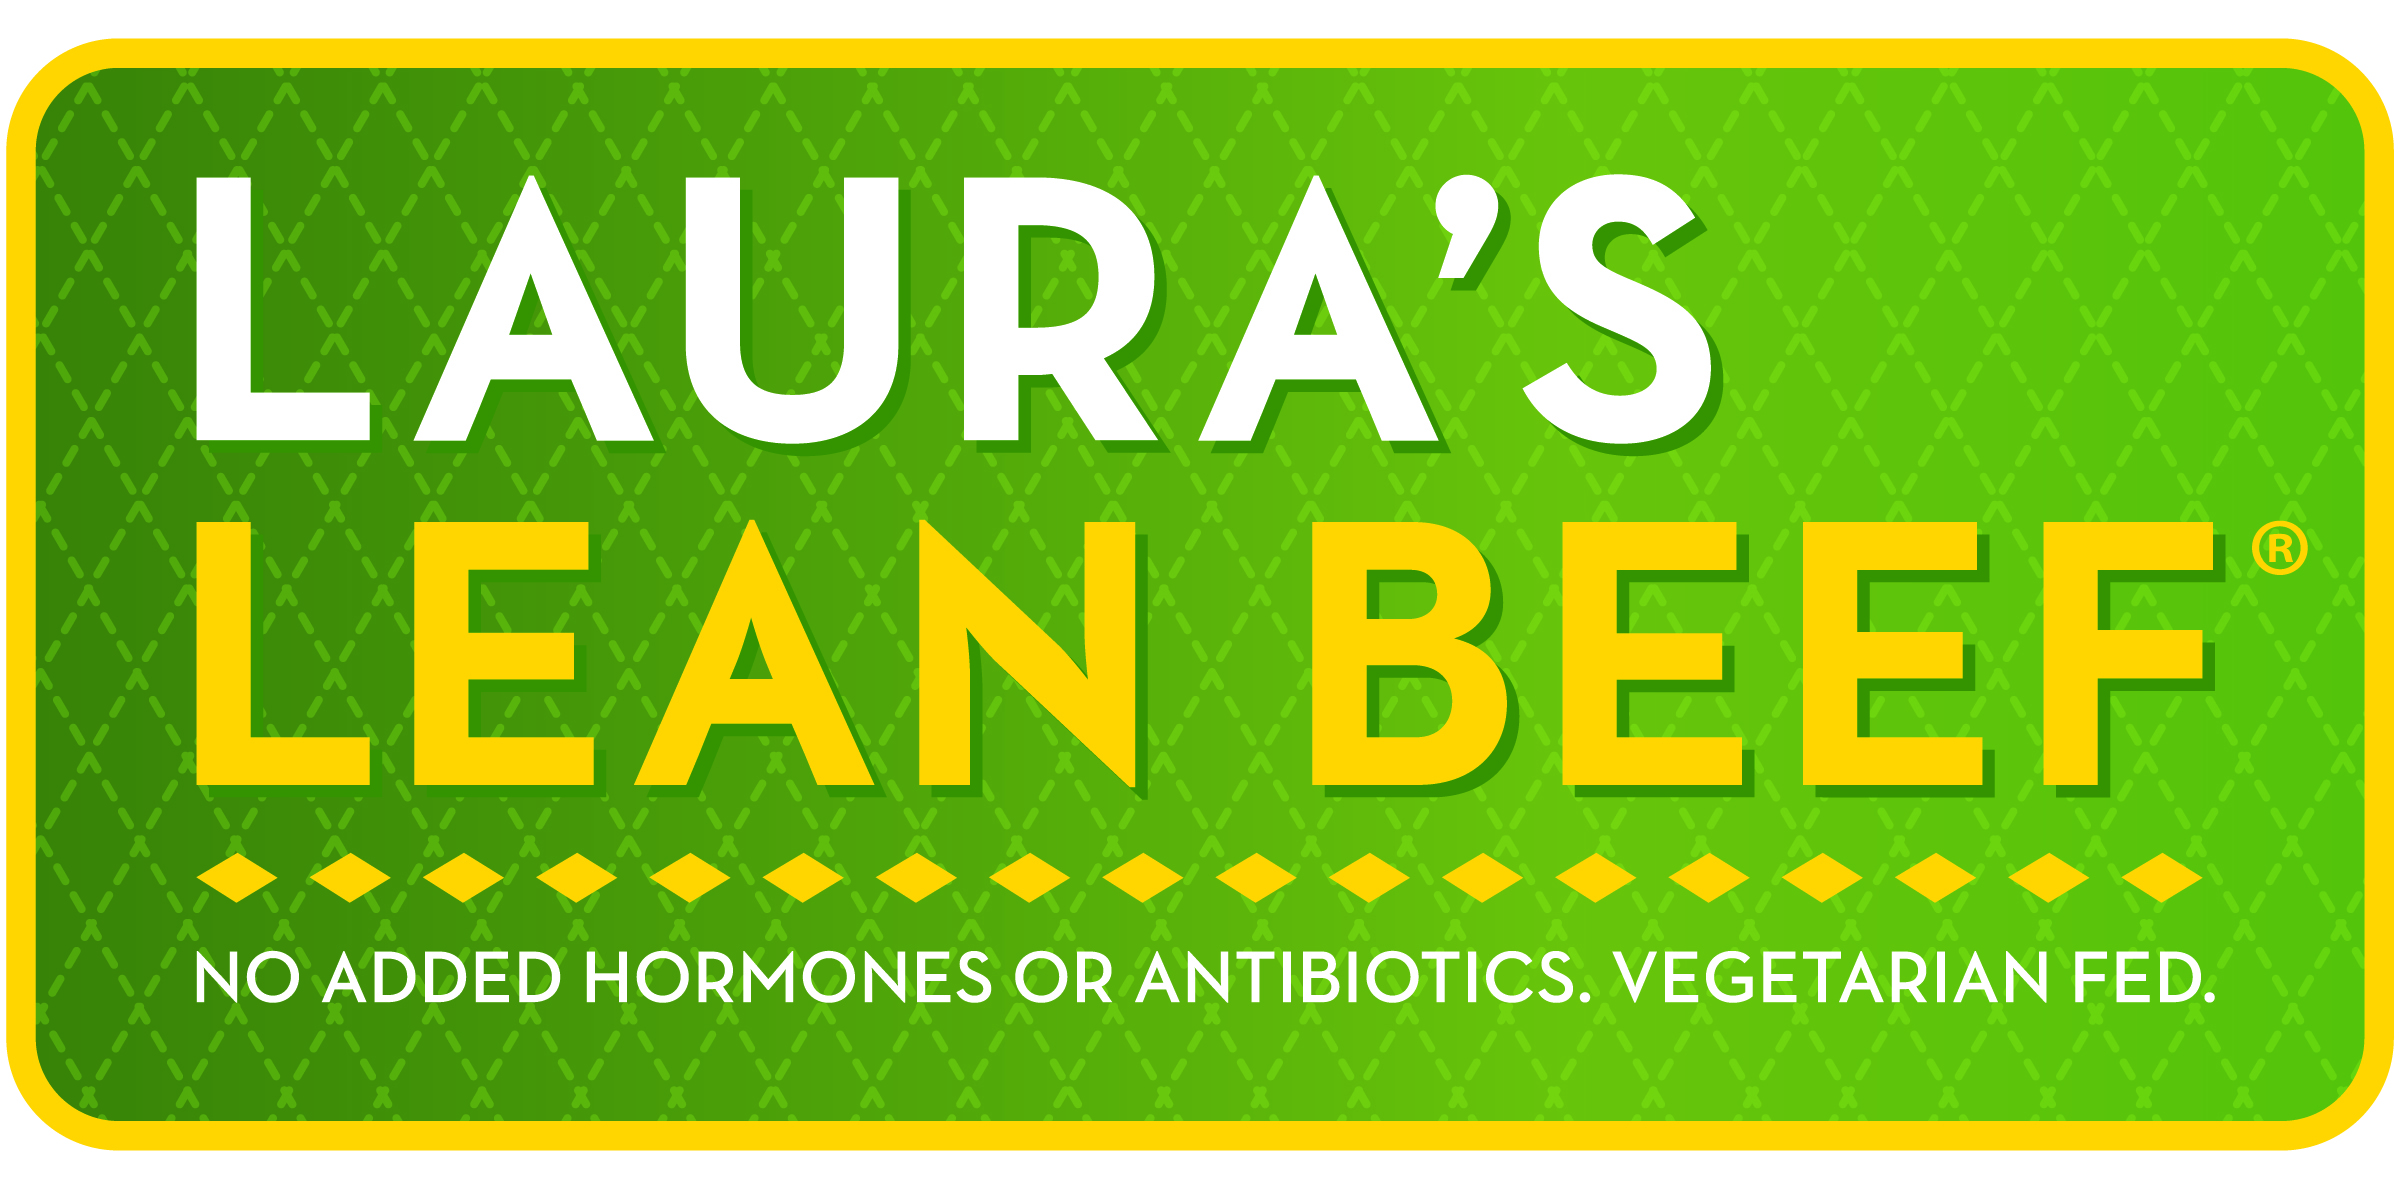 LAURA'S LEAN BEEF -